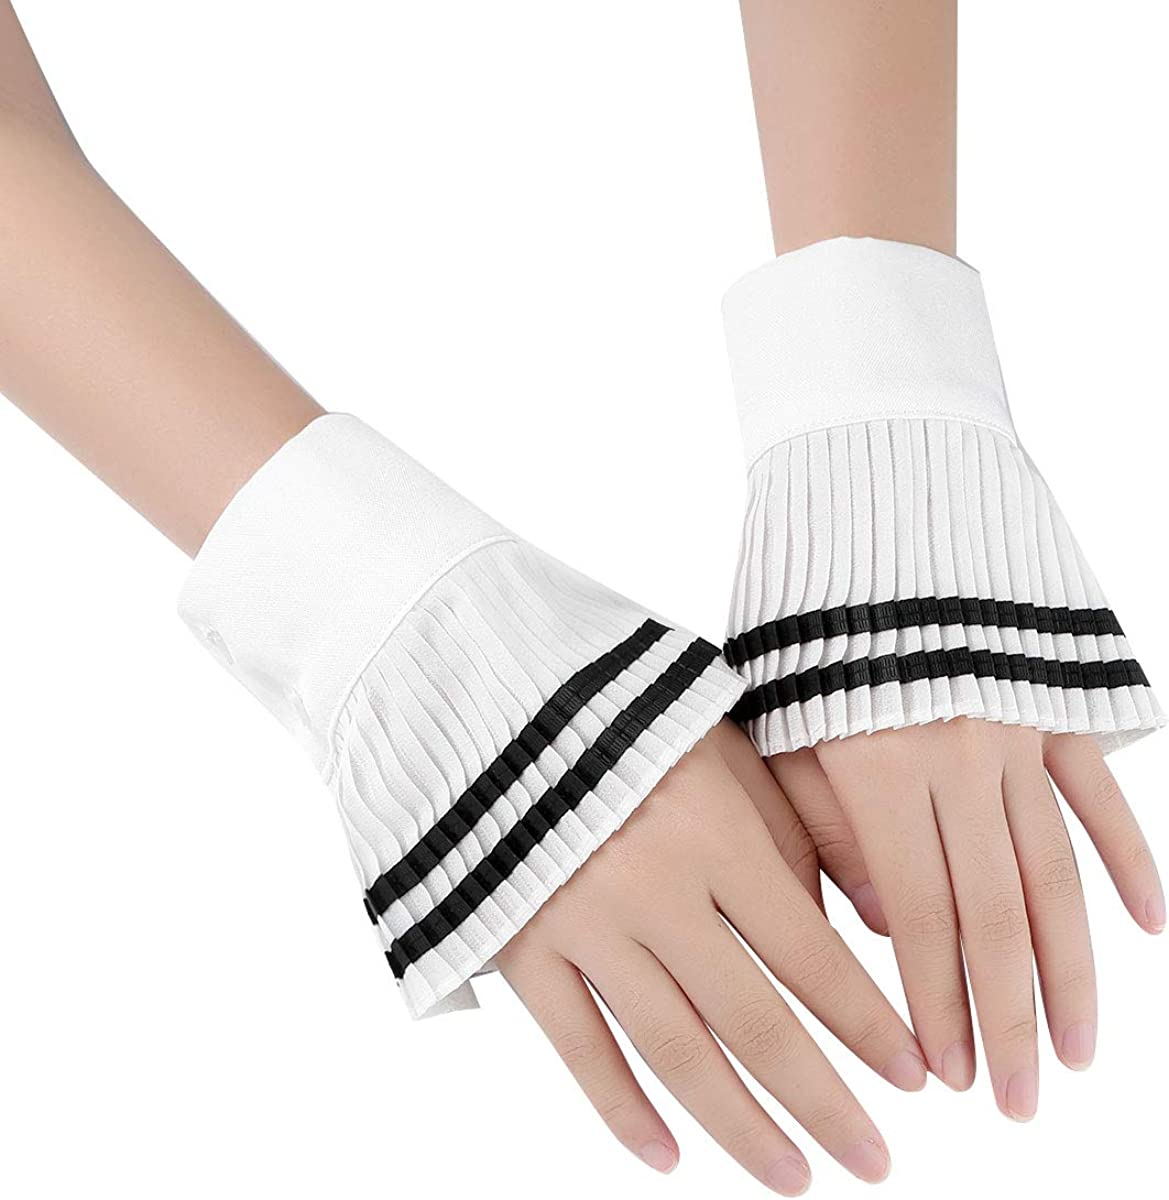 Zaldita Women Girl Fake False Sleeve Cuffs Flared Peplum Bell Wrist Cuffs Bracelets Sweater Decoration Clothing Accessories